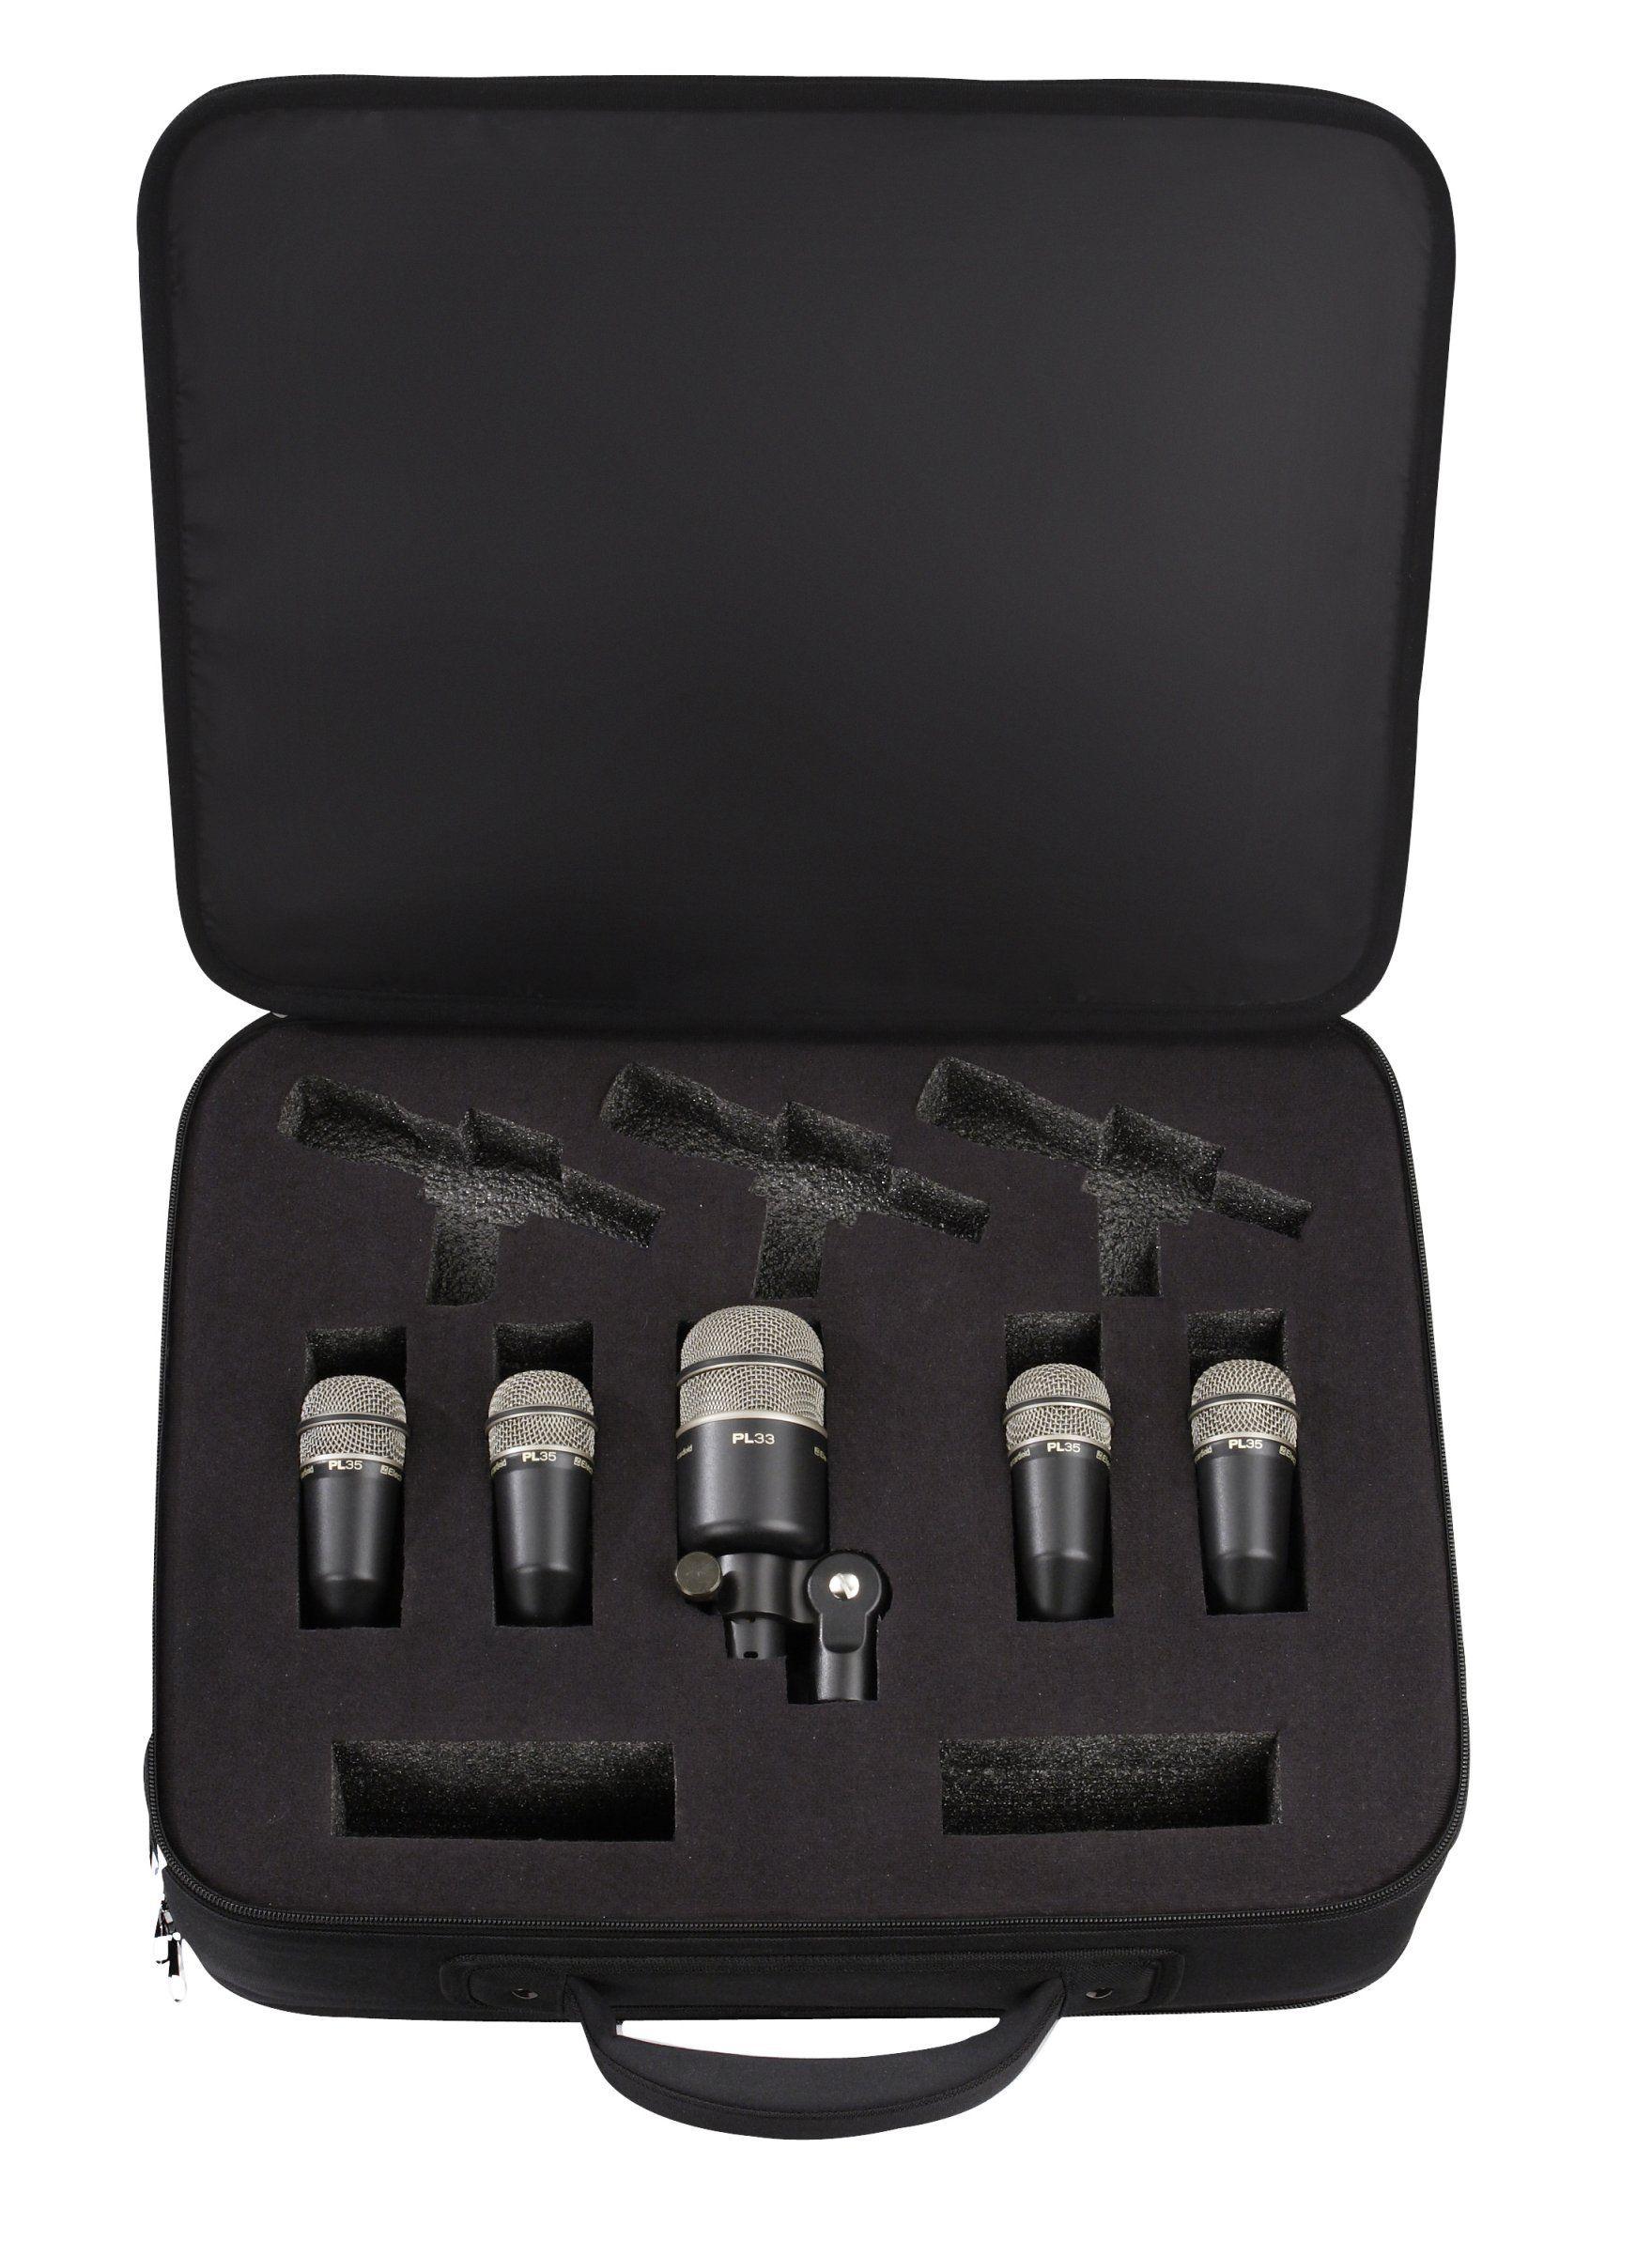 Electro Voice Pl Series Drum Mic Kit 1 Pl33 Kick Drum Mic And 4 Pl35 Snare Tom Mics Music Gear Drums Microphones